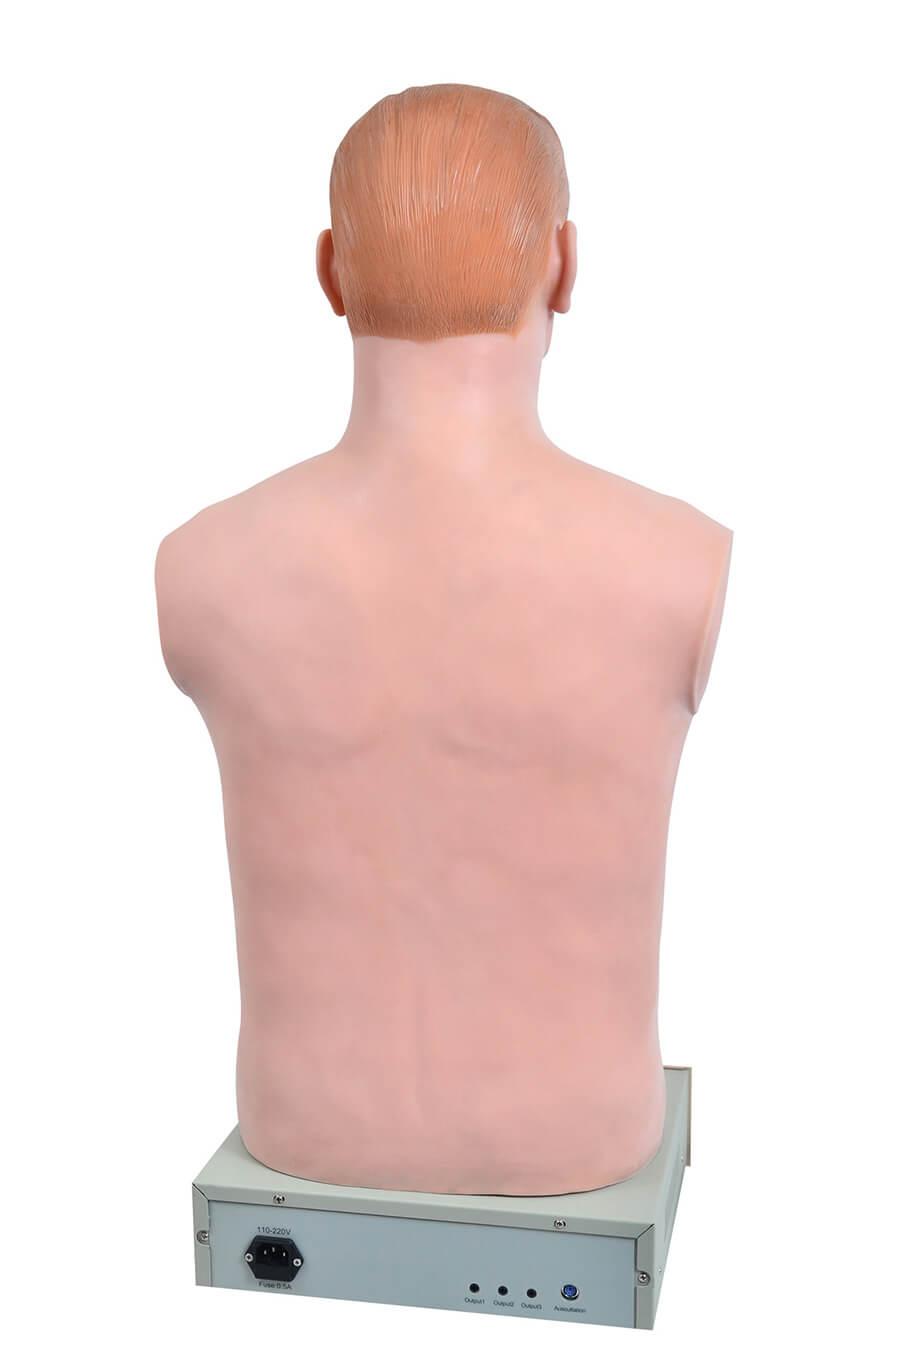 Simulador de Ausculta Cardiopulmonar c/ Controle Remoto